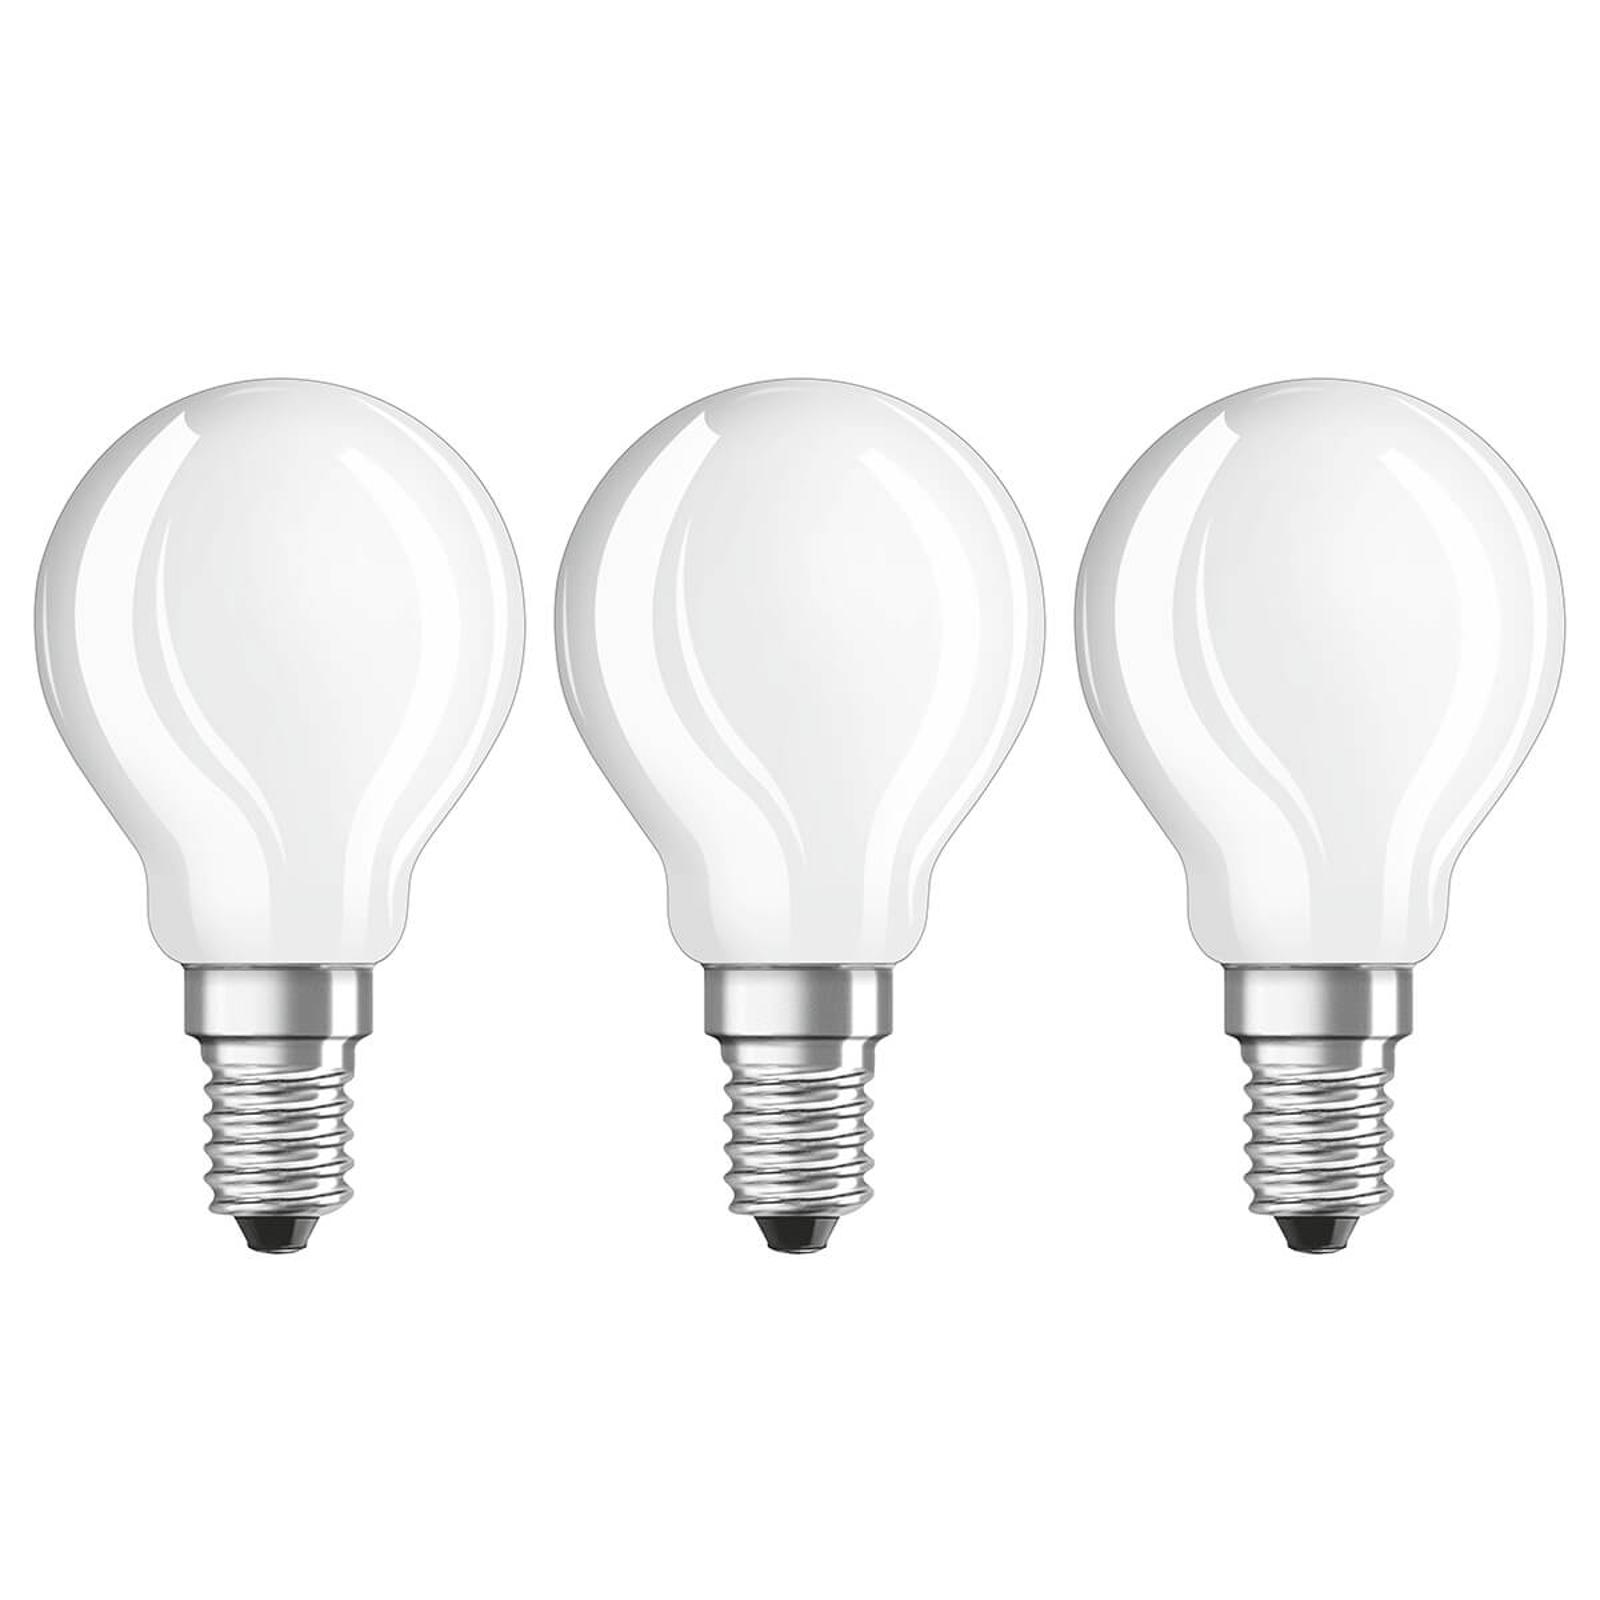 LED-Lampe E14 4W, warmweiß, 470 Lumen, 3er-Set